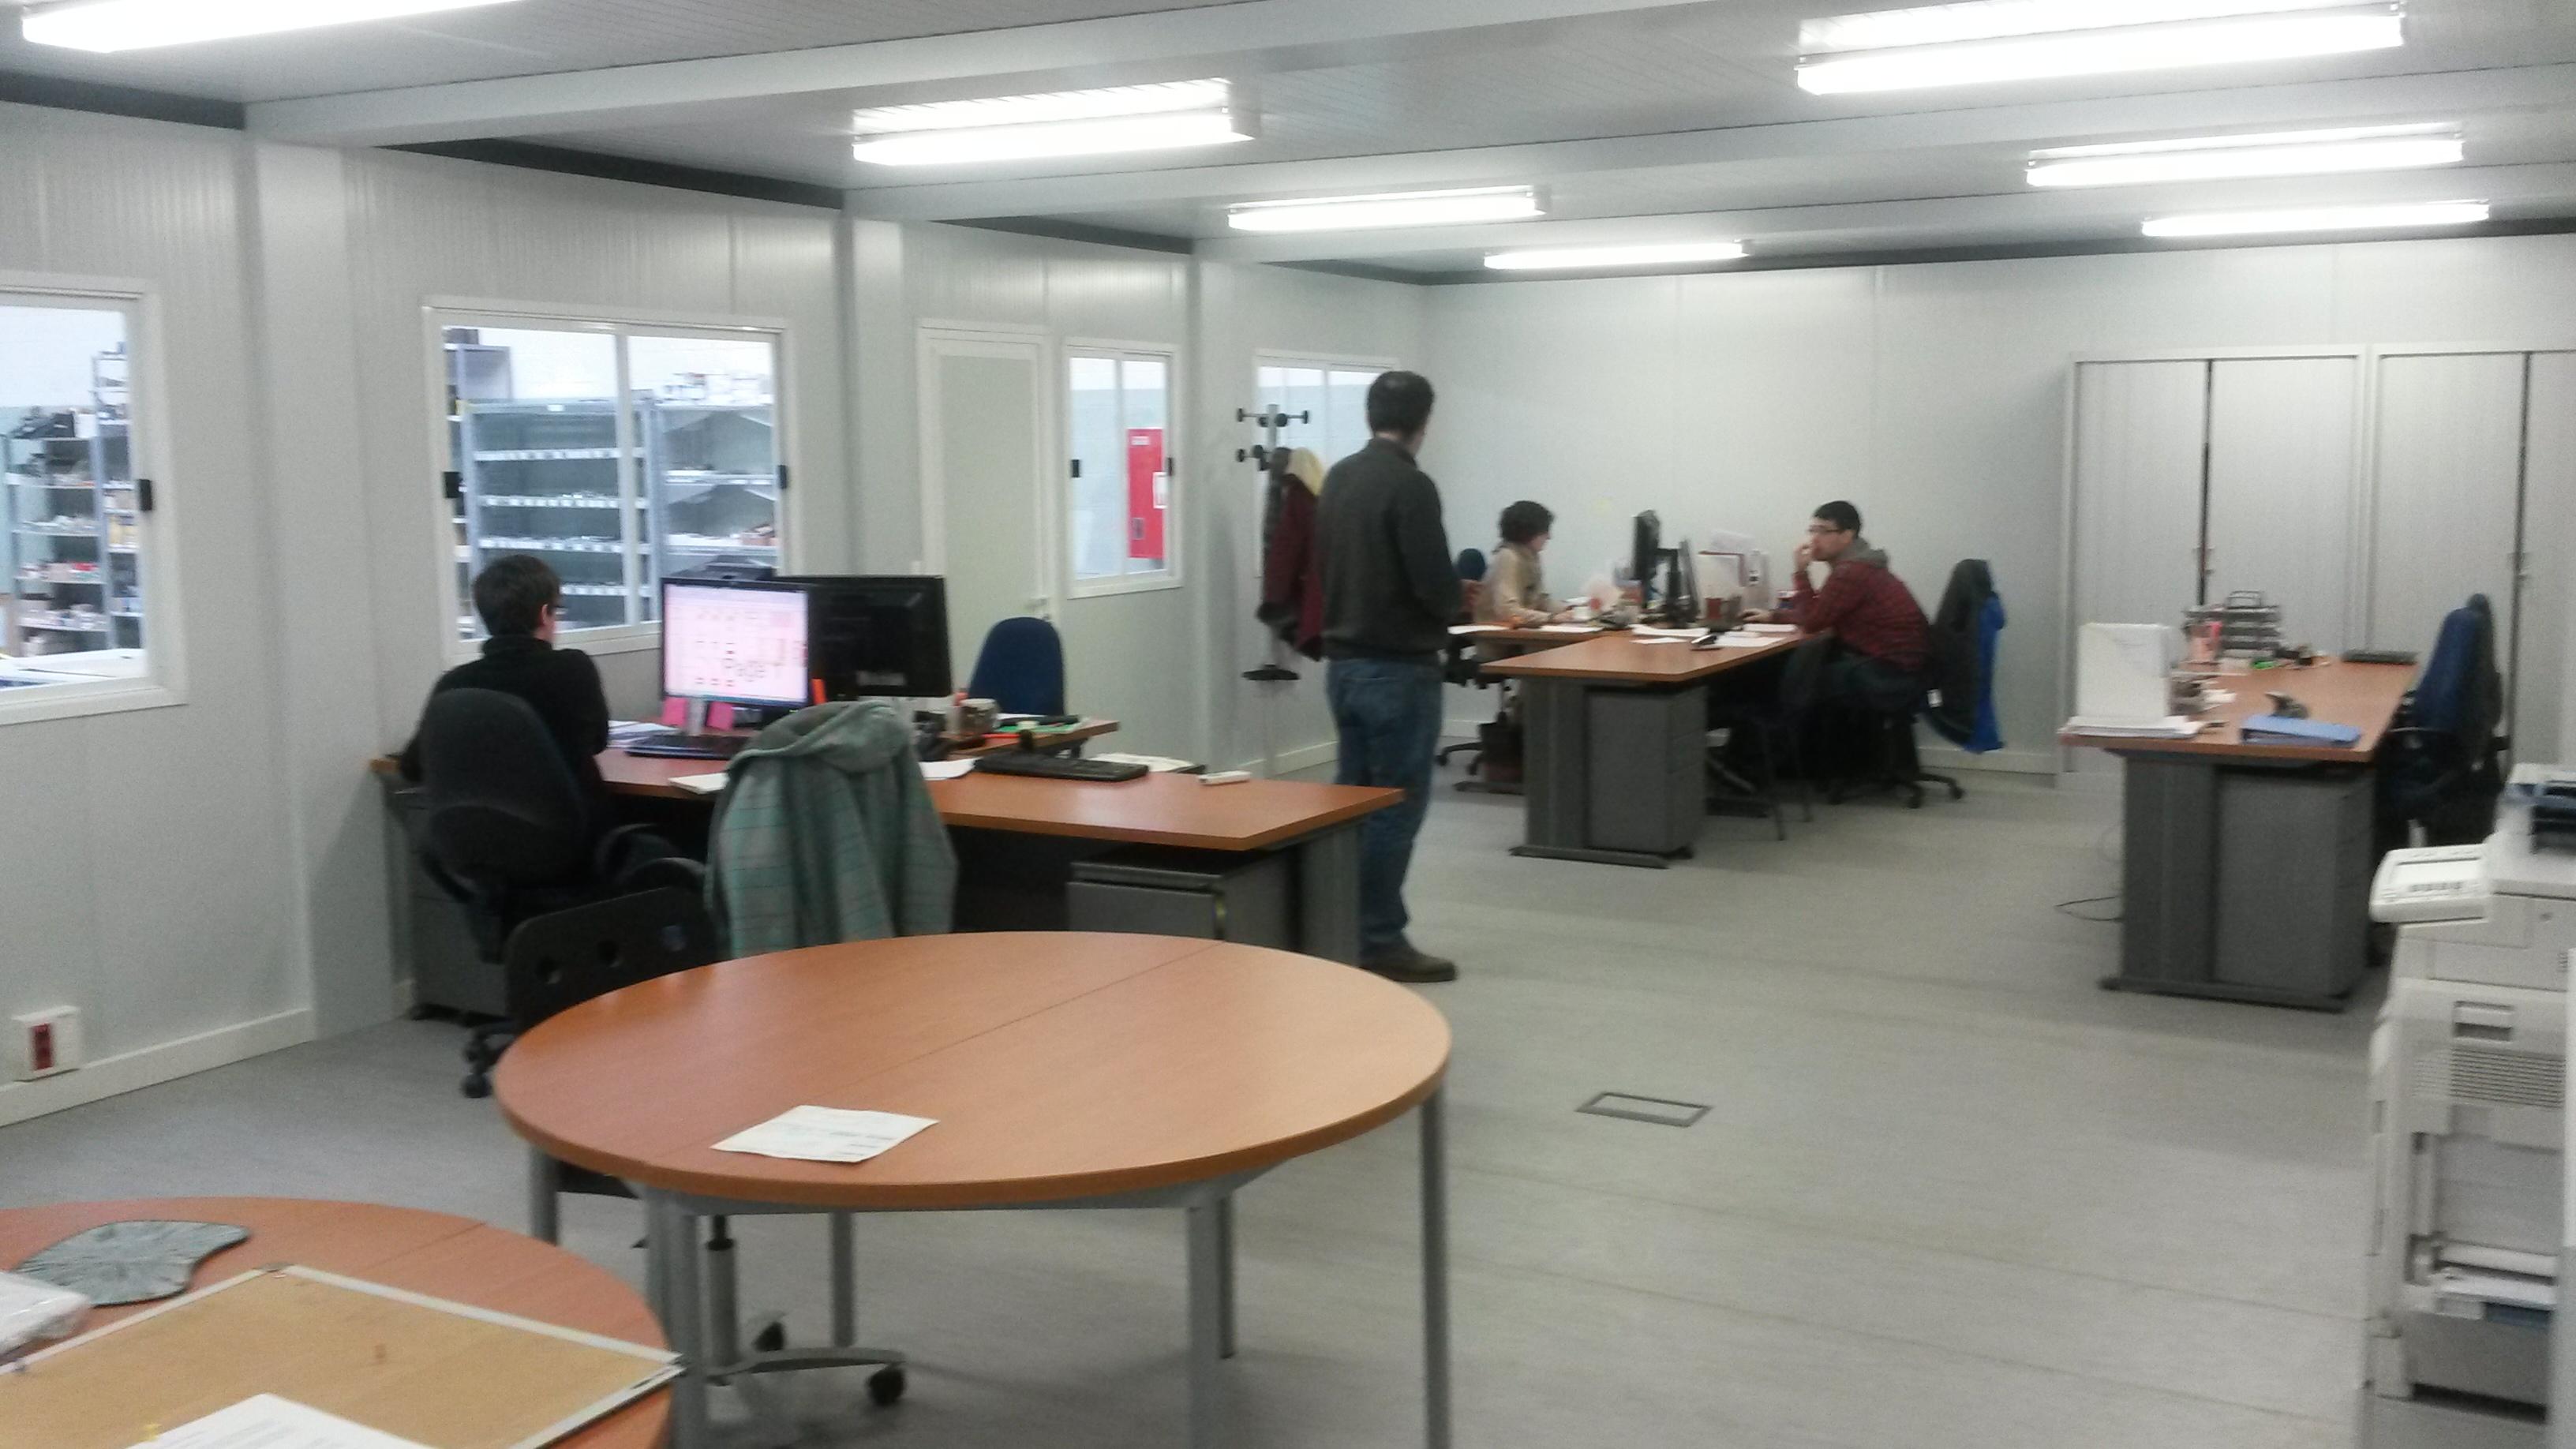 balat oficinas modulares de interior en novargi balat